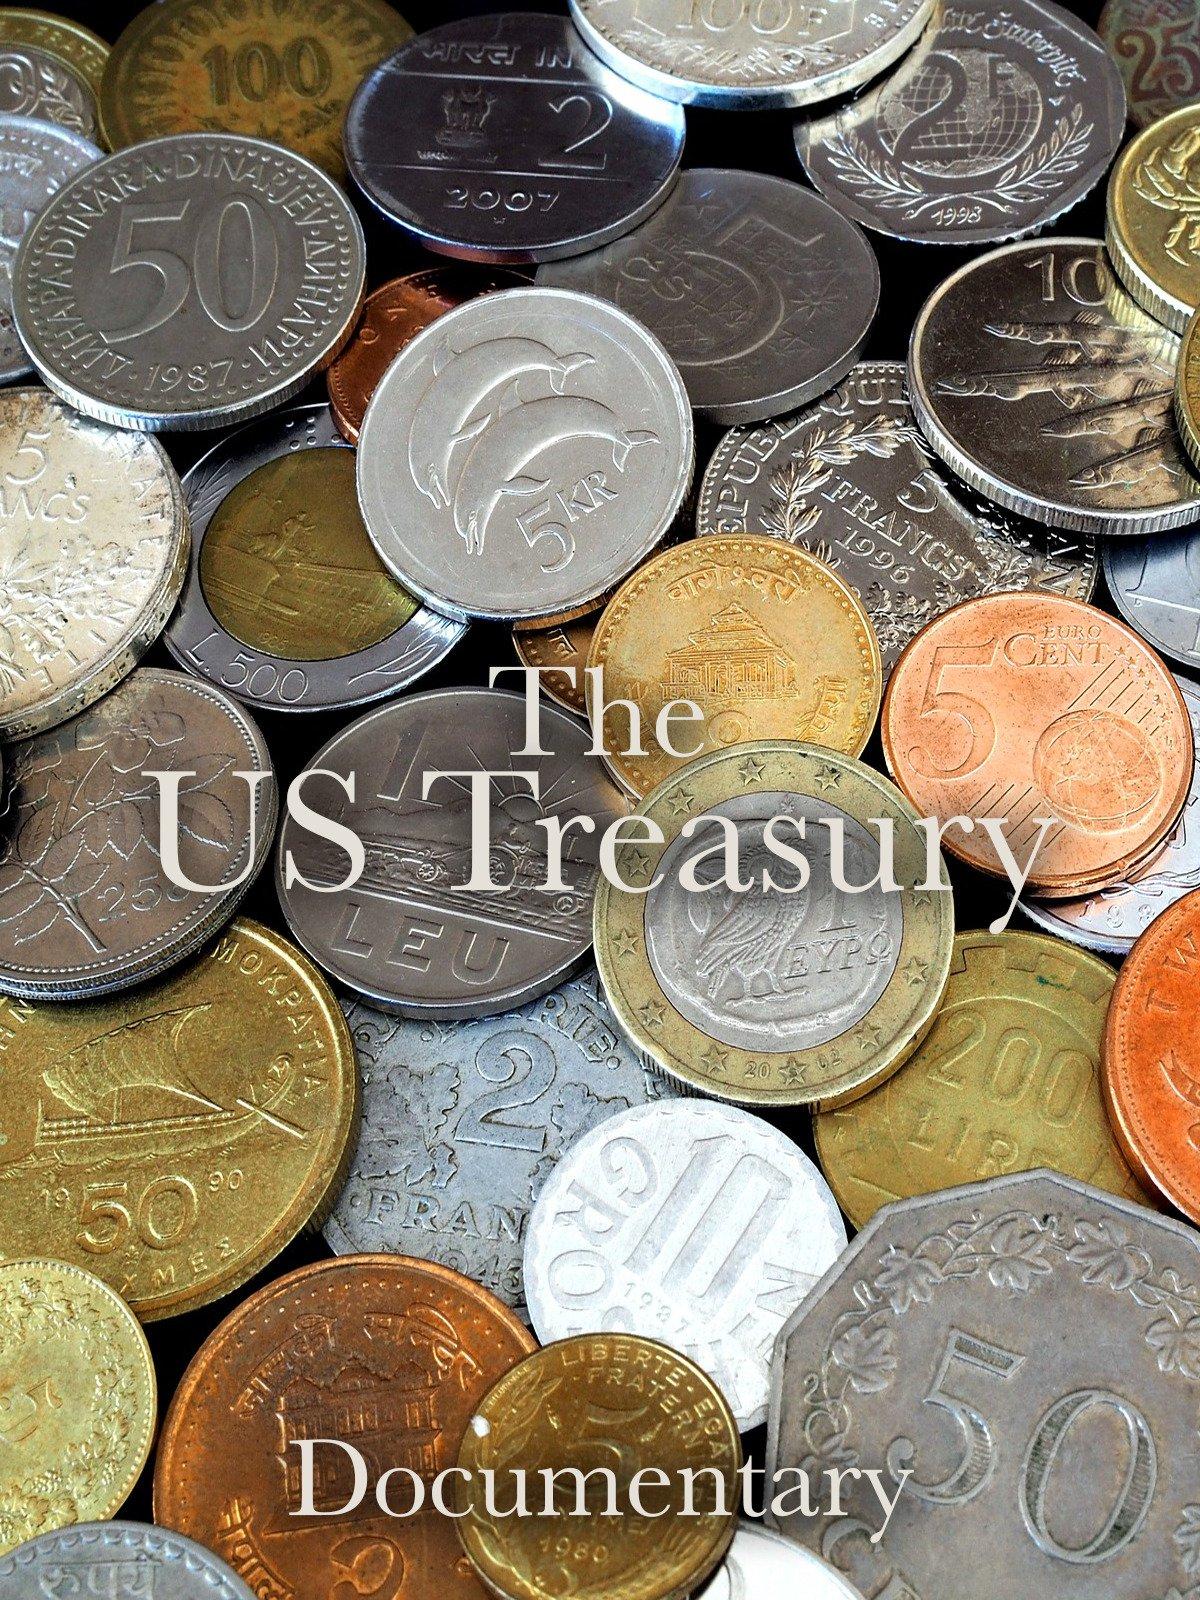 The US Treasury Documentary